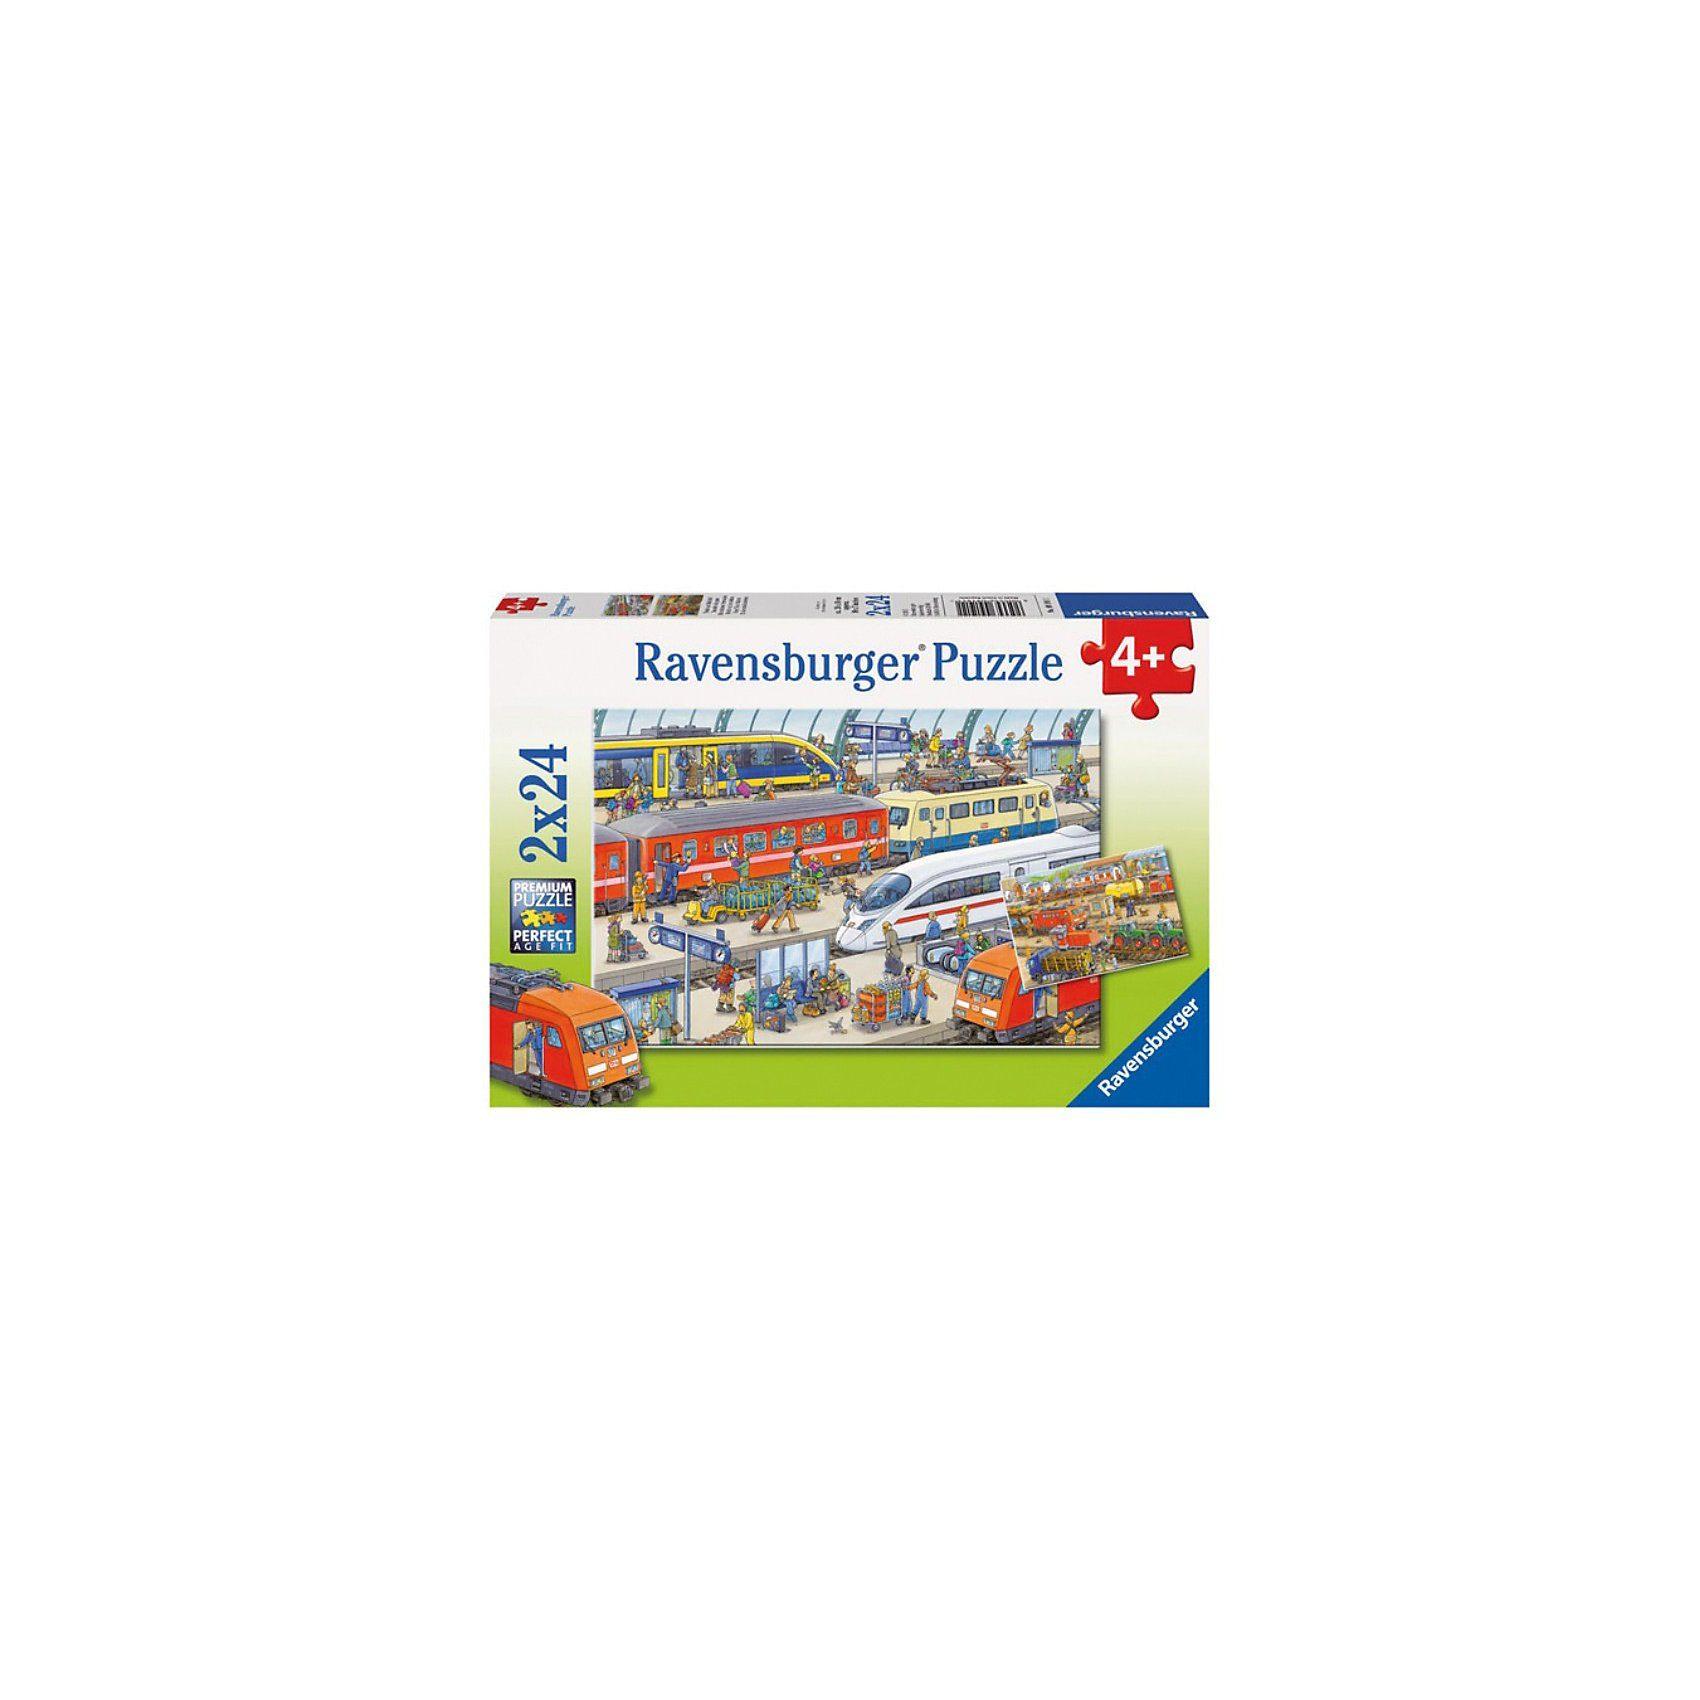 Ravensburger Trubel am Bahnhof Puzzleset 2 x 24 Teile